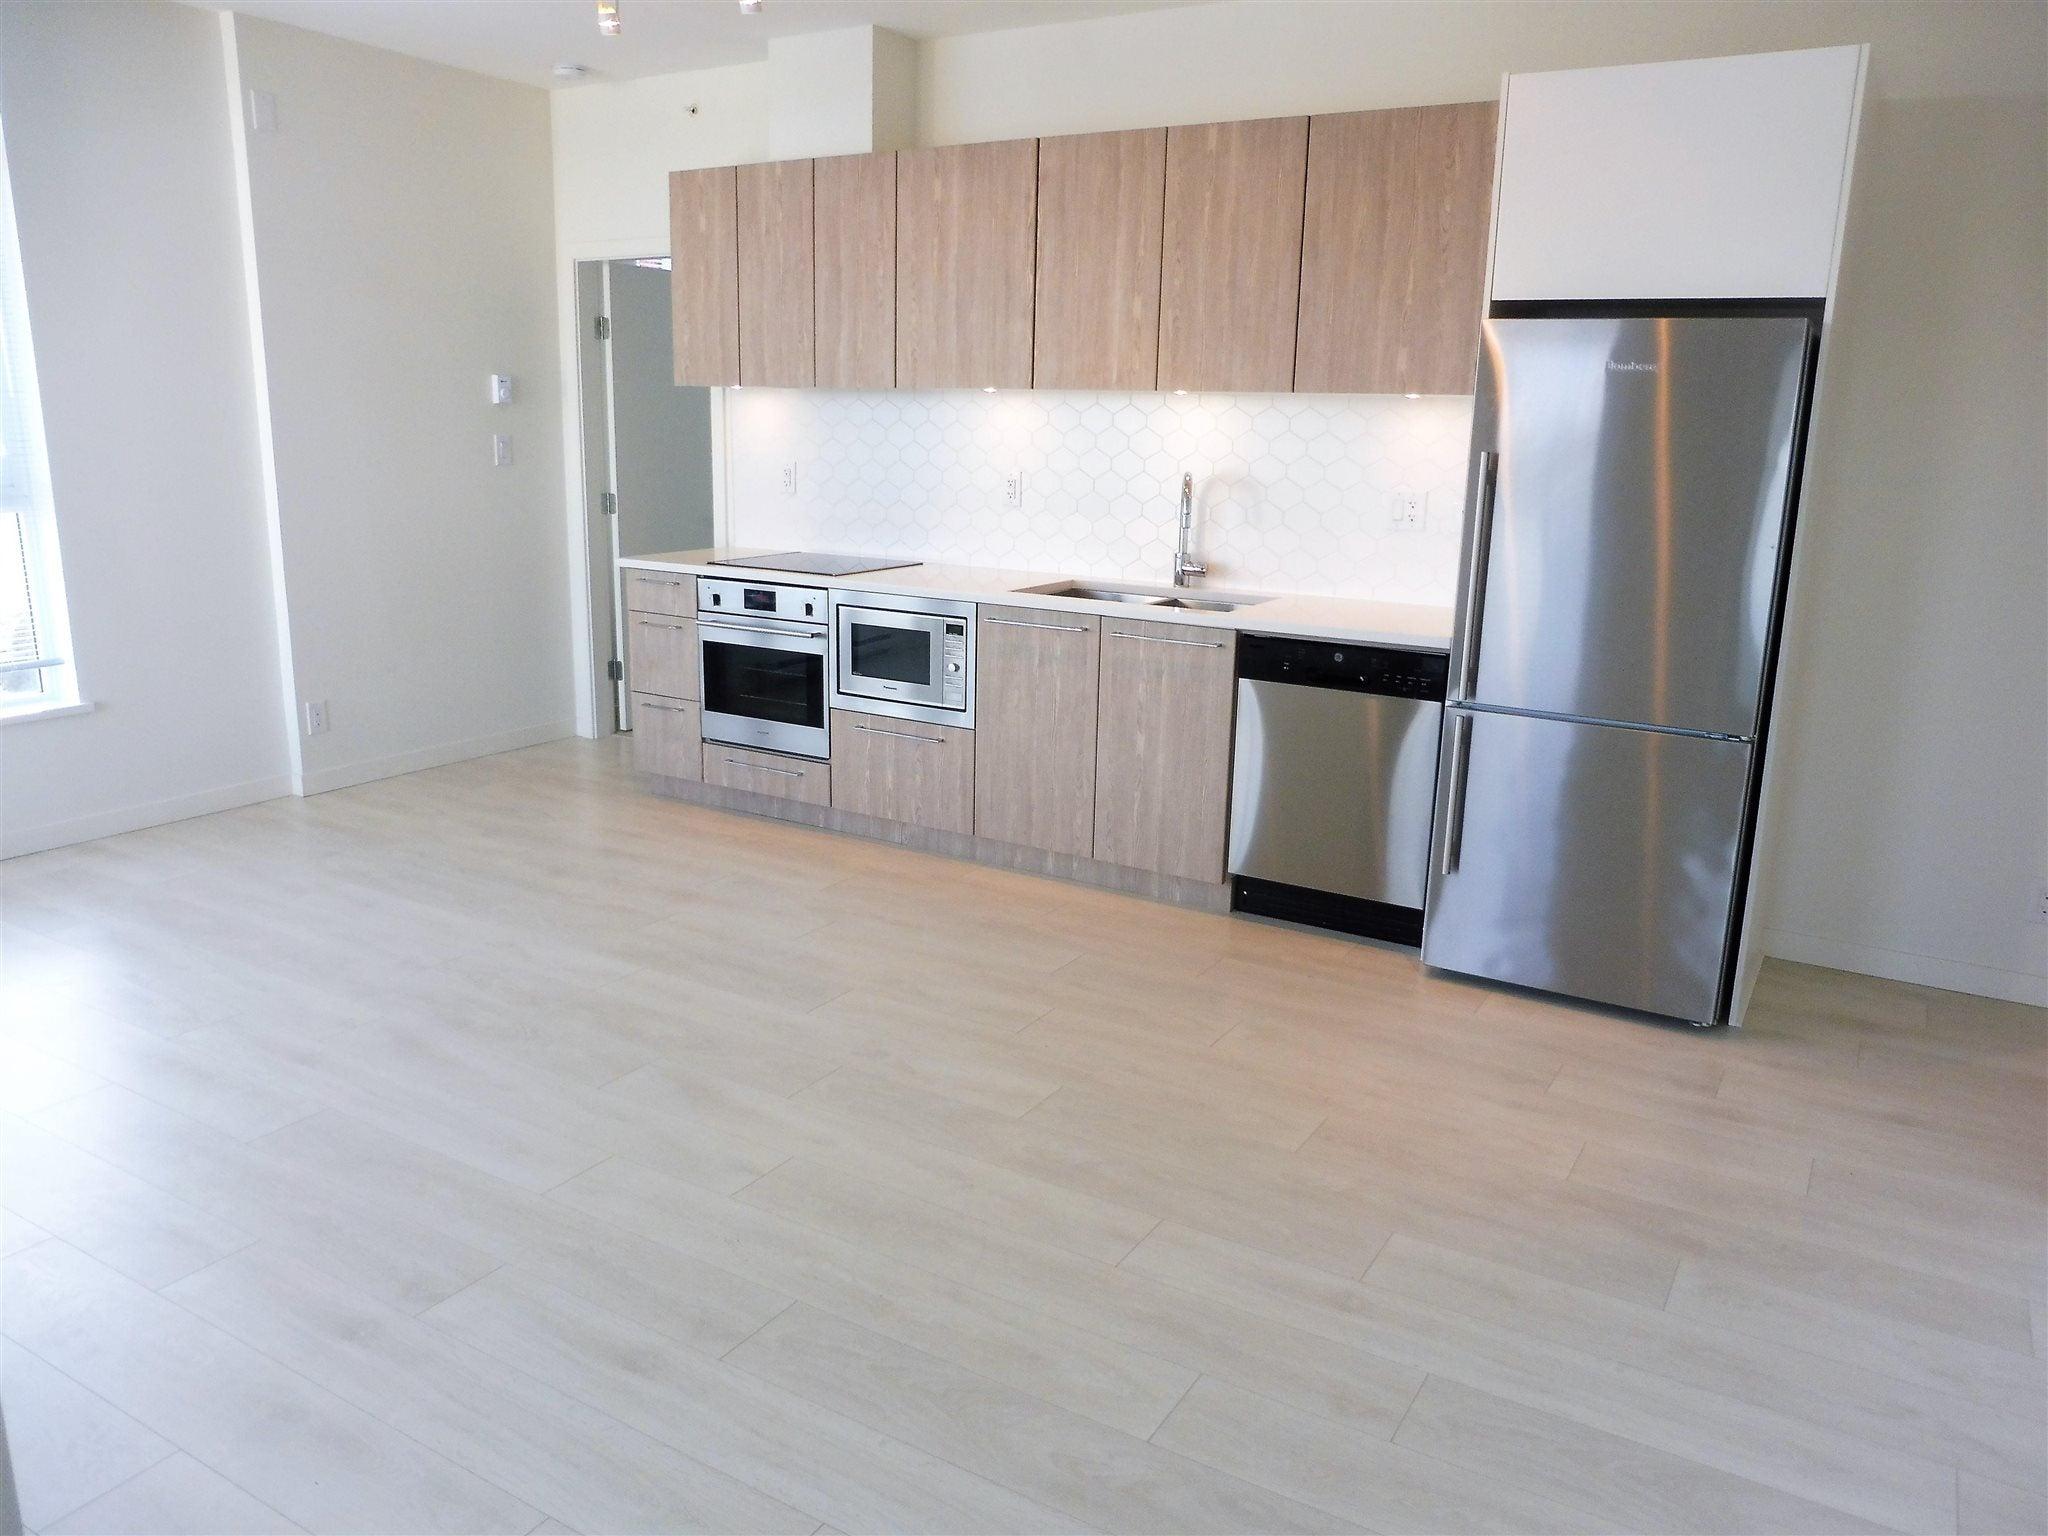 1409 691 NORTH ROAD - Coquitlam West Apartment/Condo for sale, 2 Bedrooms (R2604155) - #7